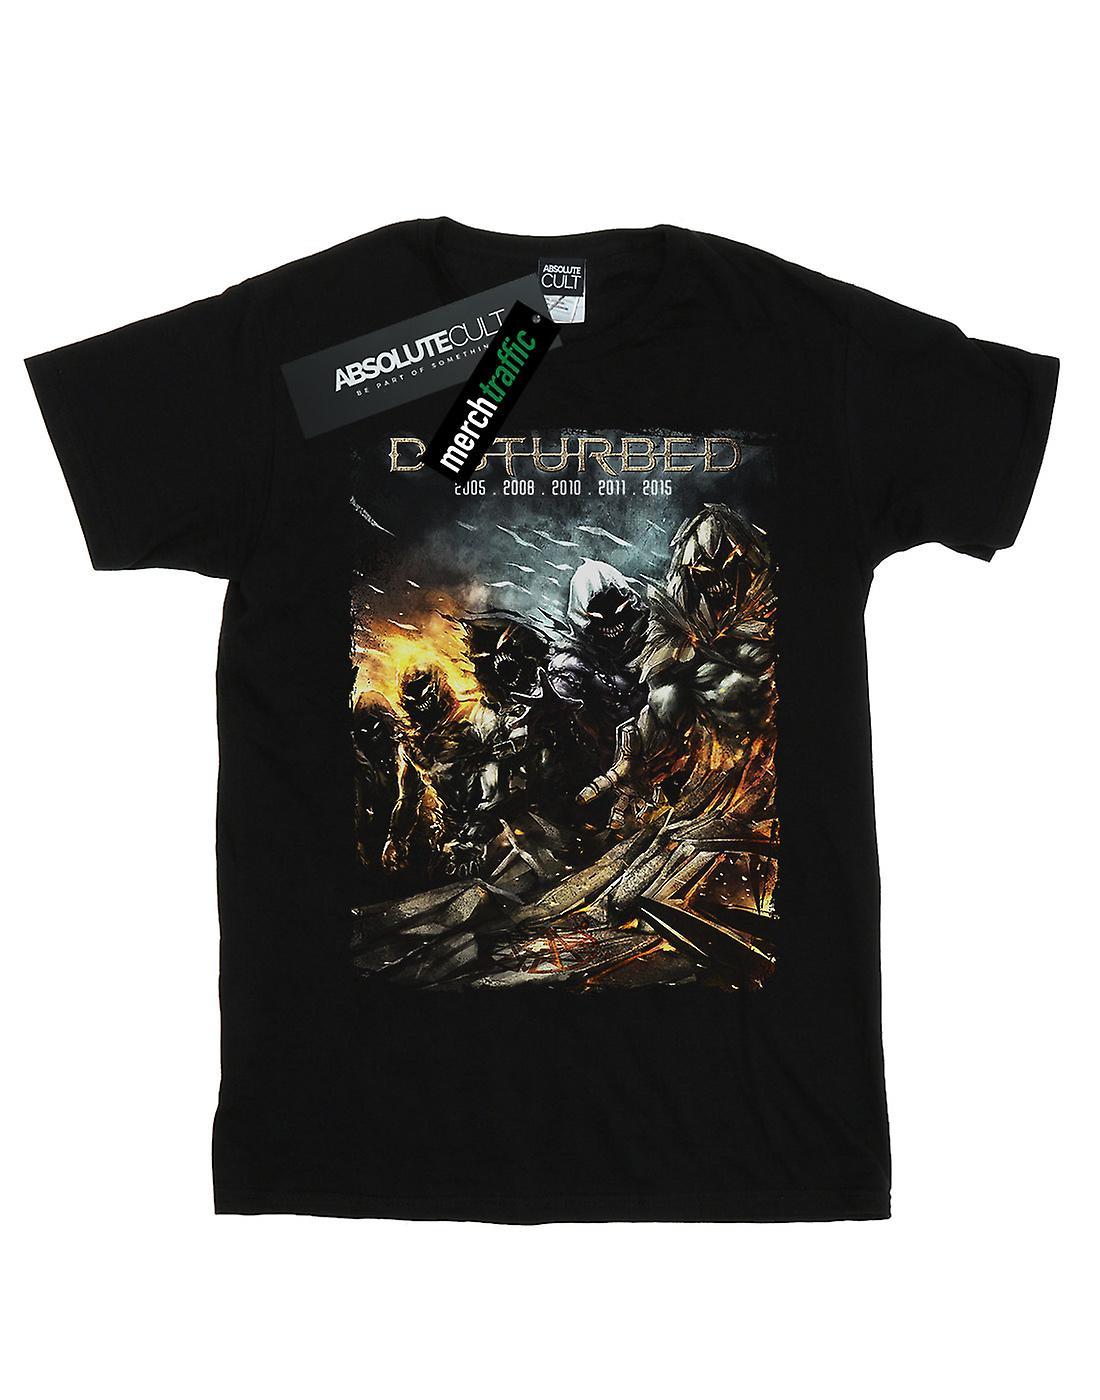 Disturbed Boys Evolution Box T-Shirt